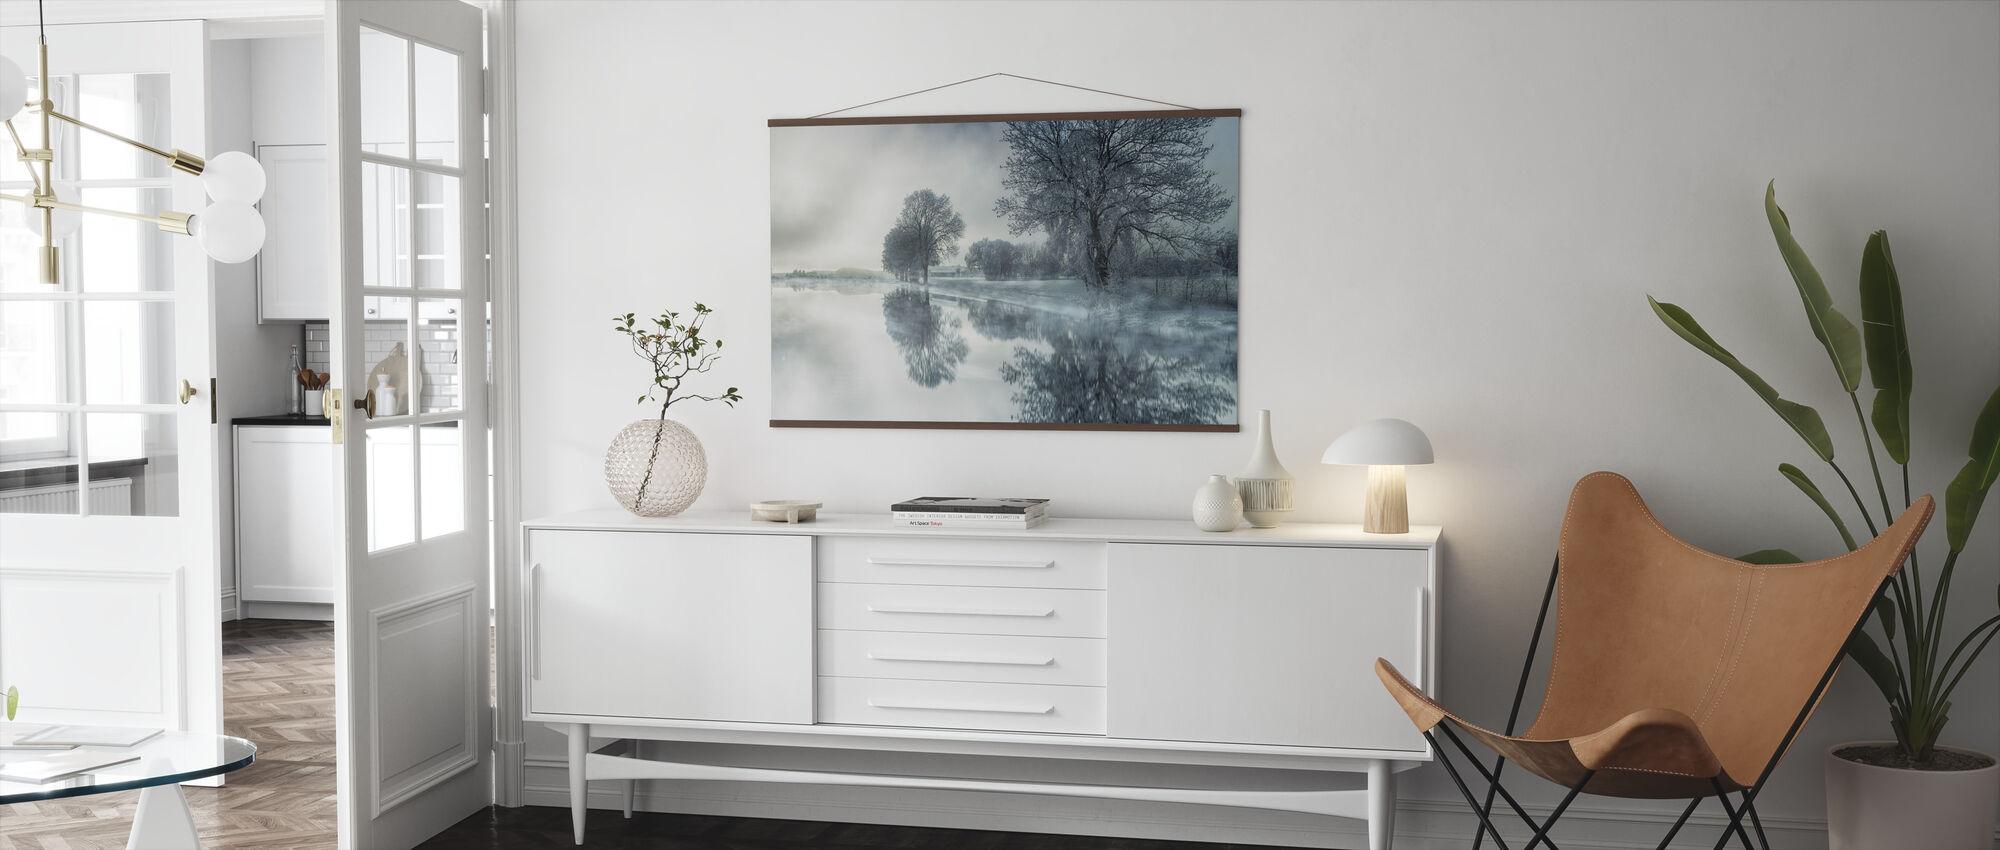 Mirror Lake - Poster - Living Room